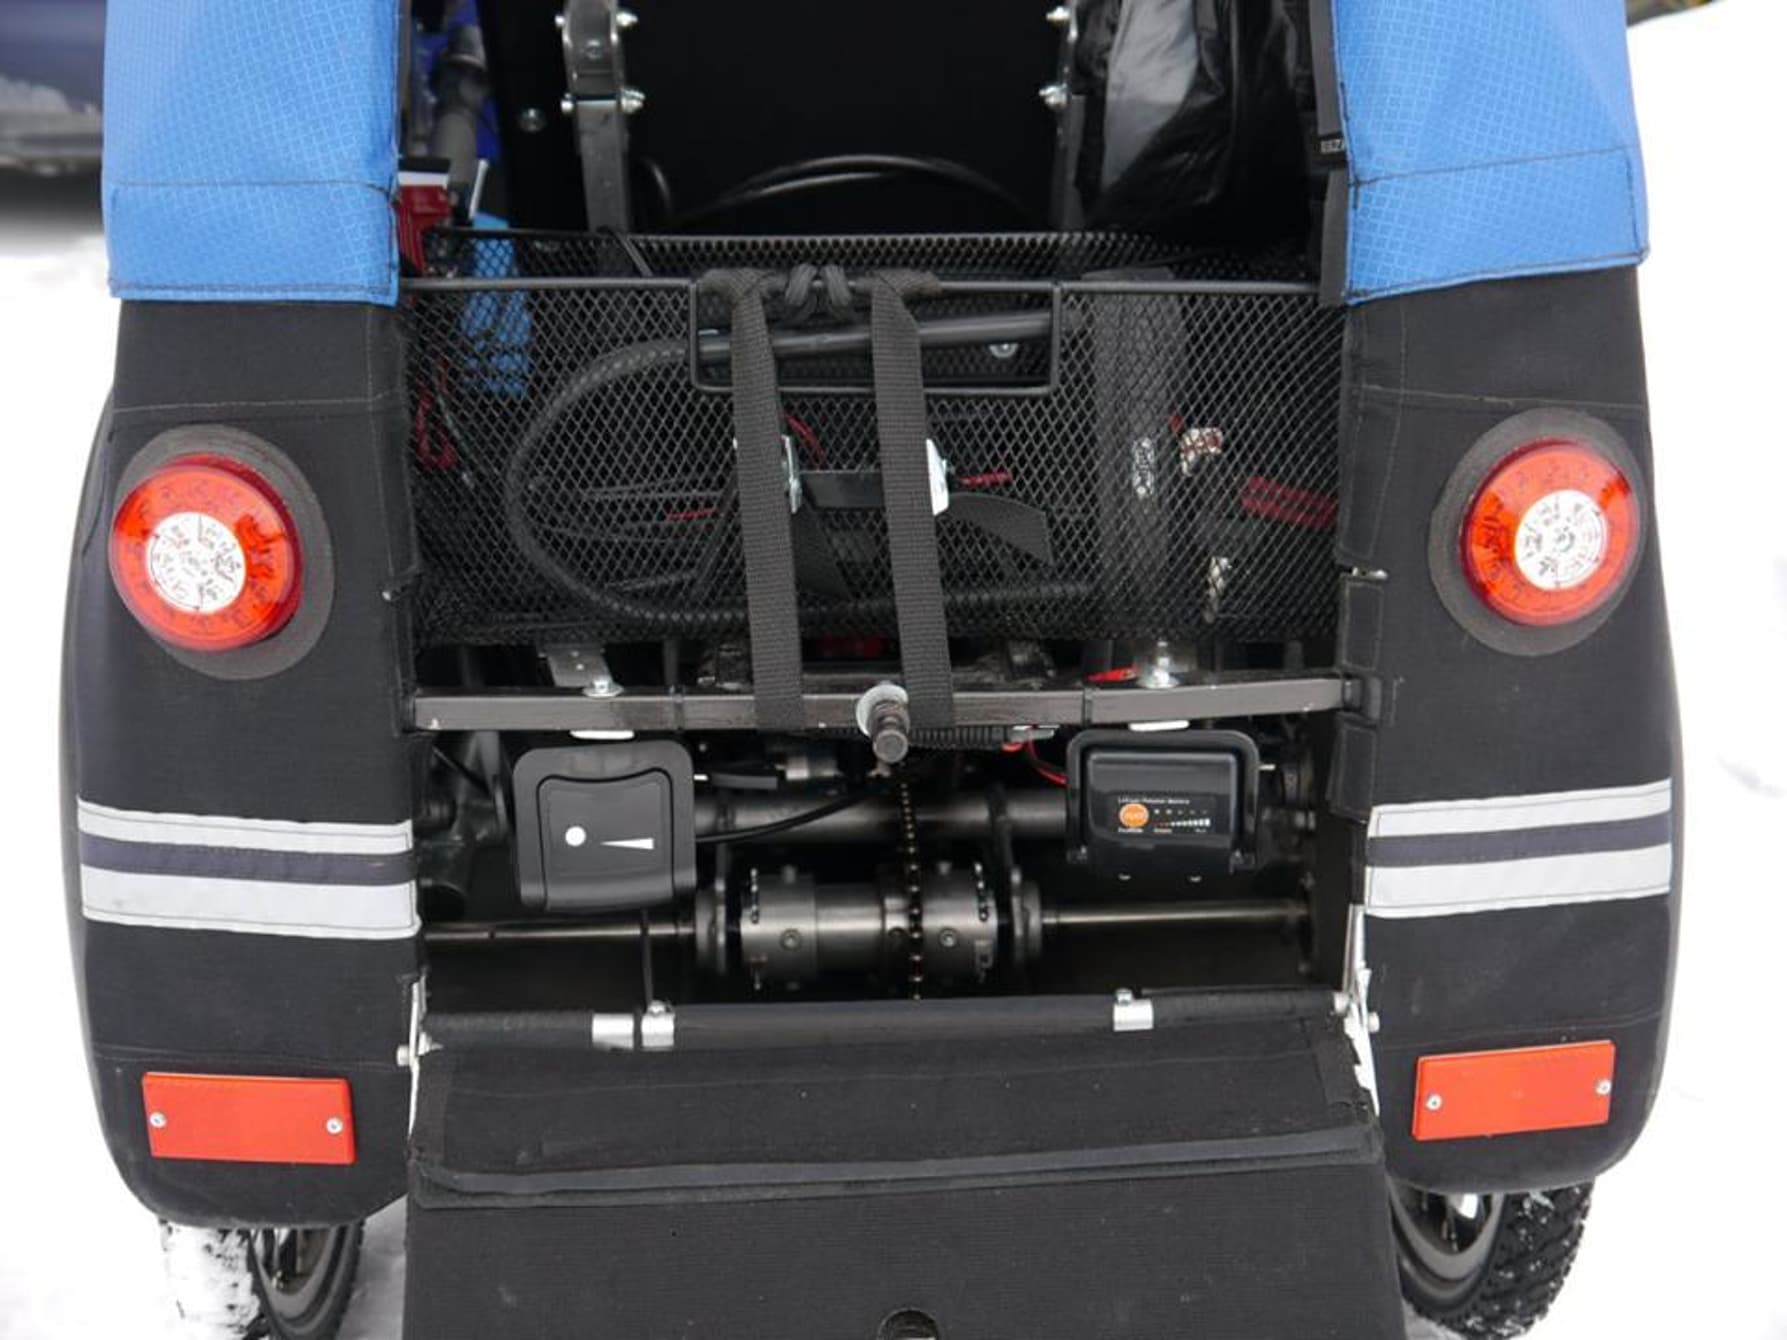 Тот же PodRide, вид сзади (фото: JMK-Innovation).